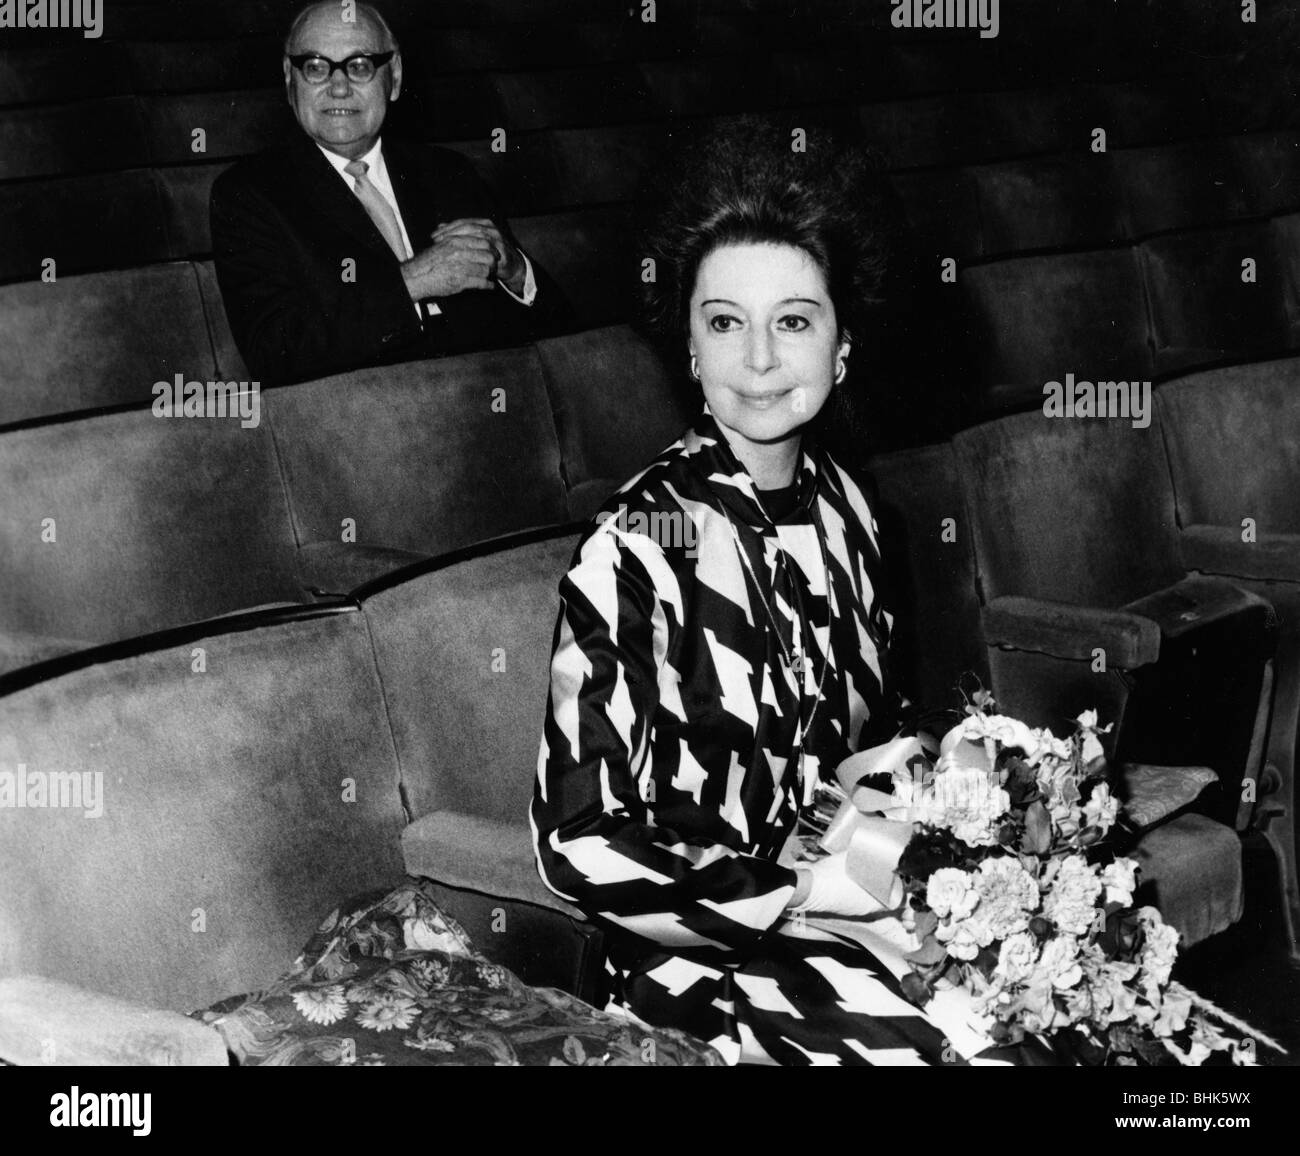 Dame Alicia Markova (1910- ), Britsh ballet dancer. - Stock Image